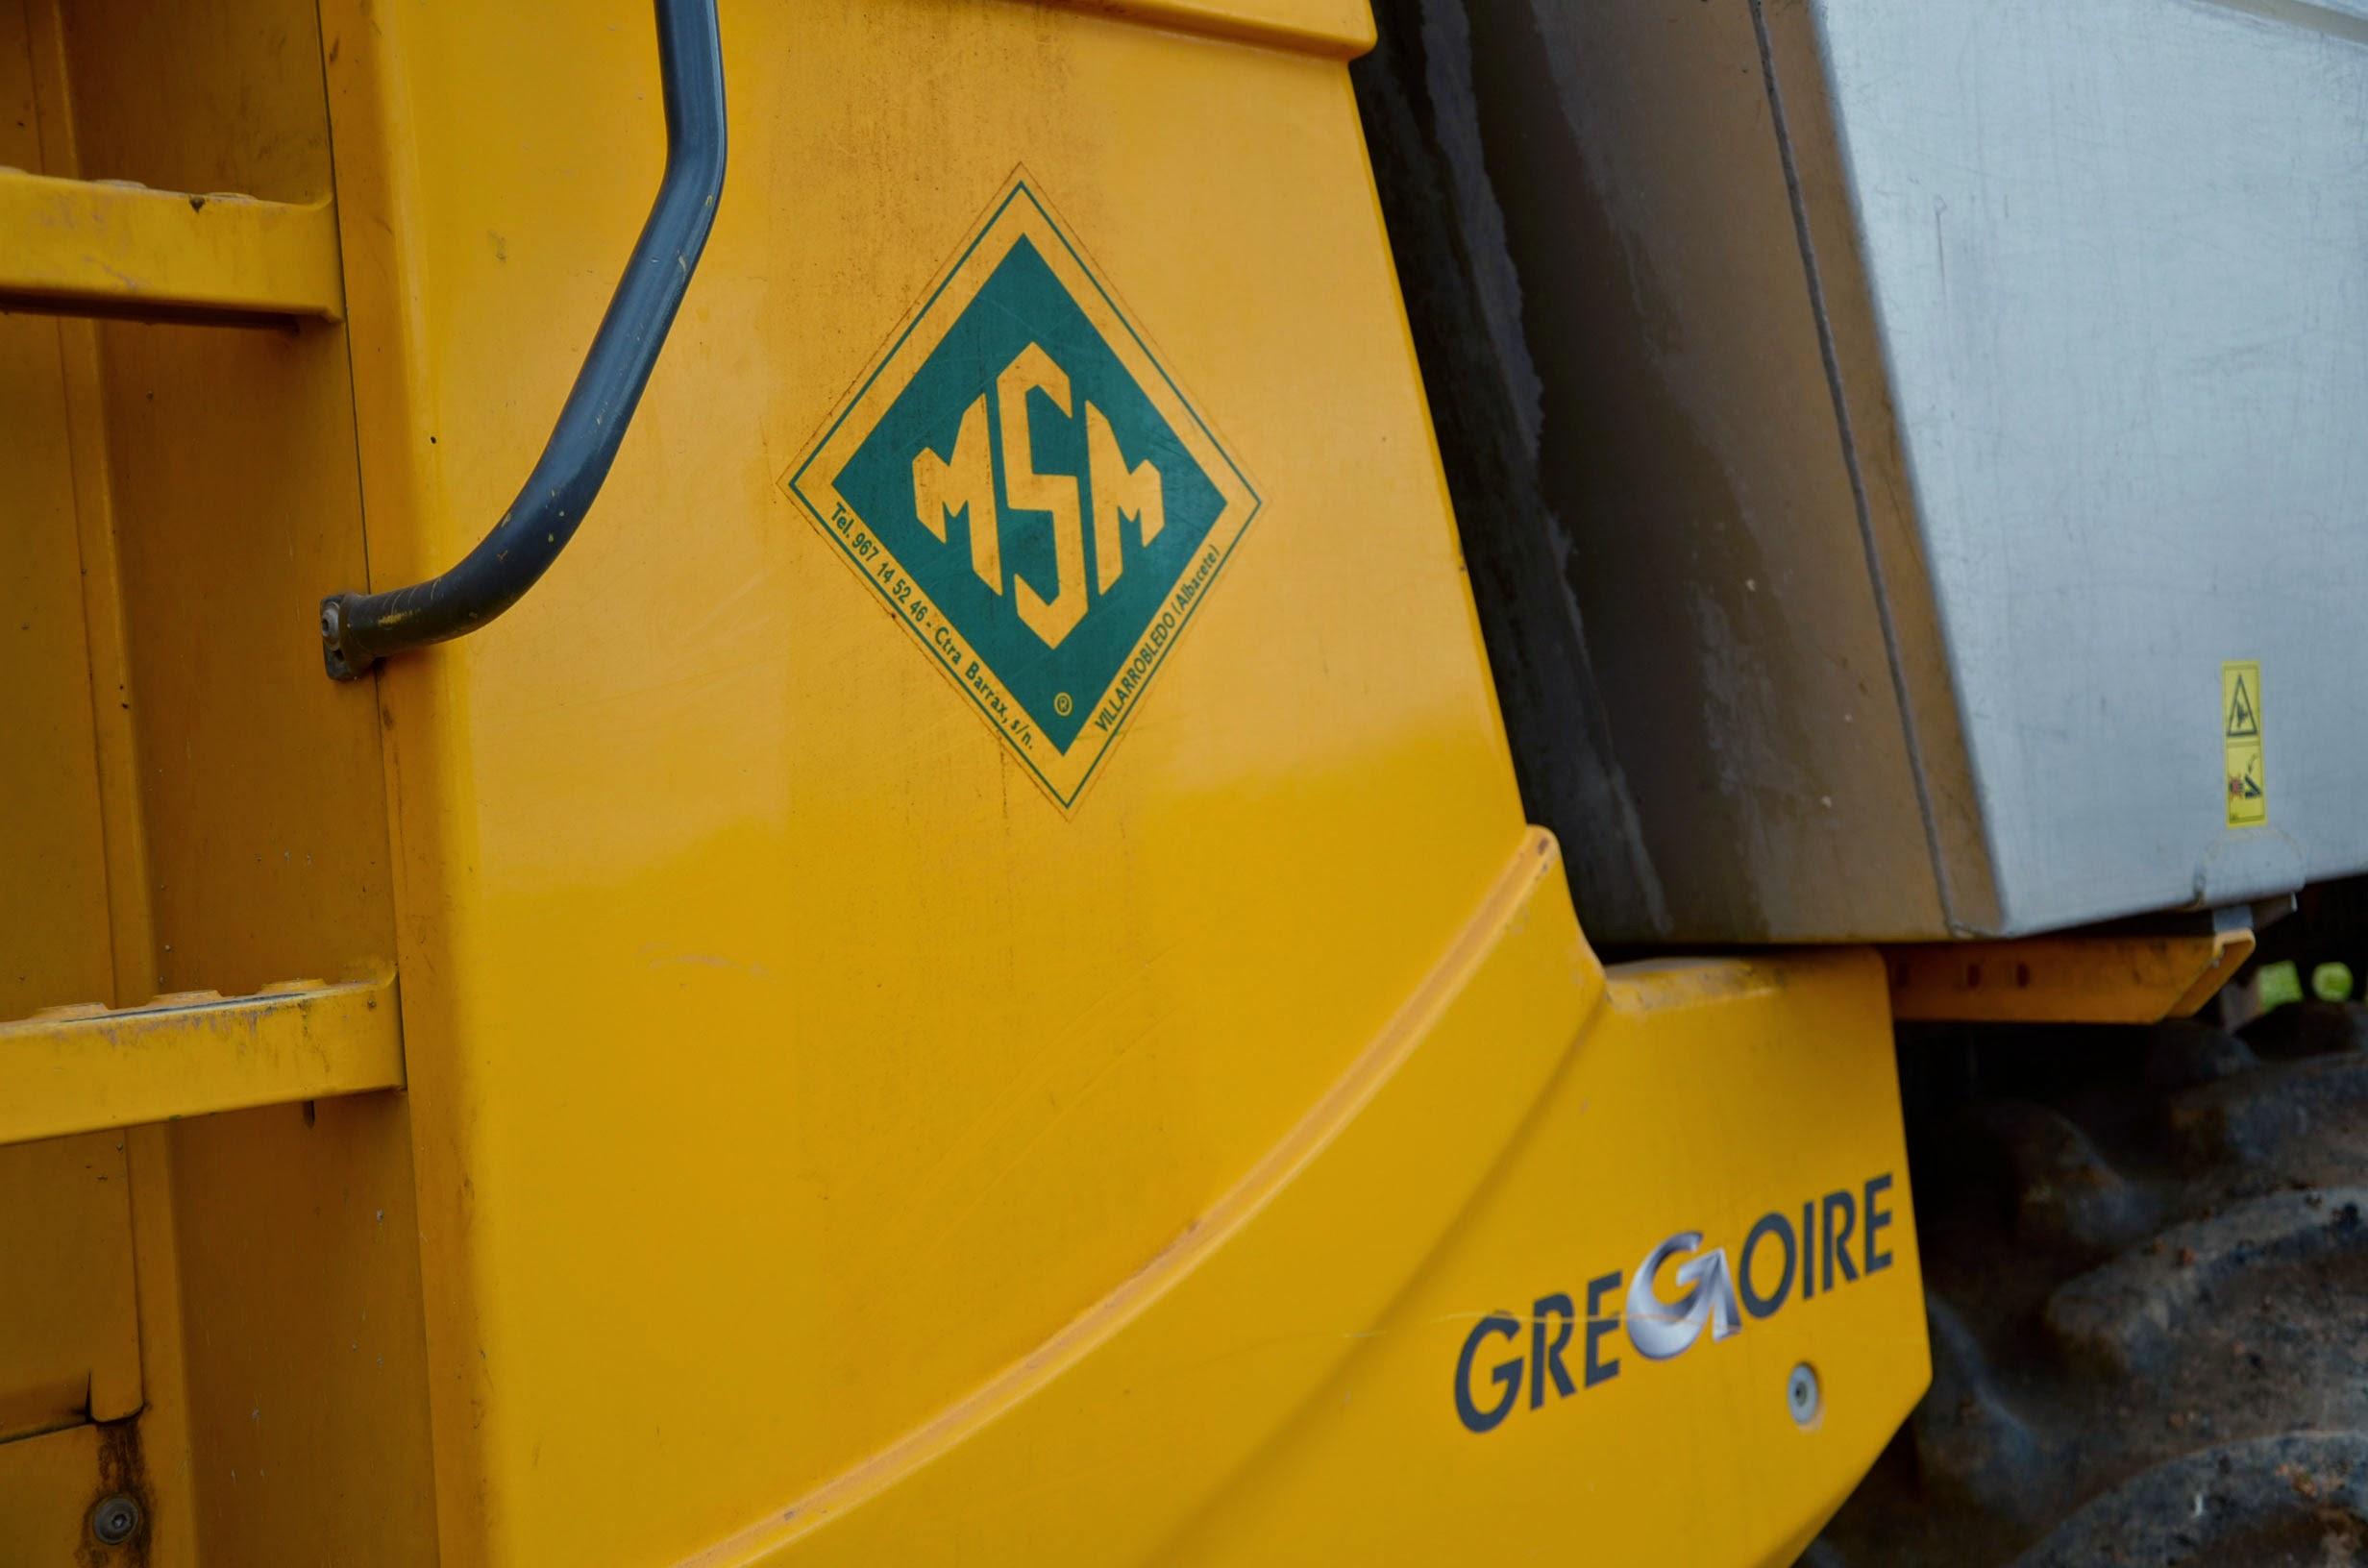 gregoireG8-48